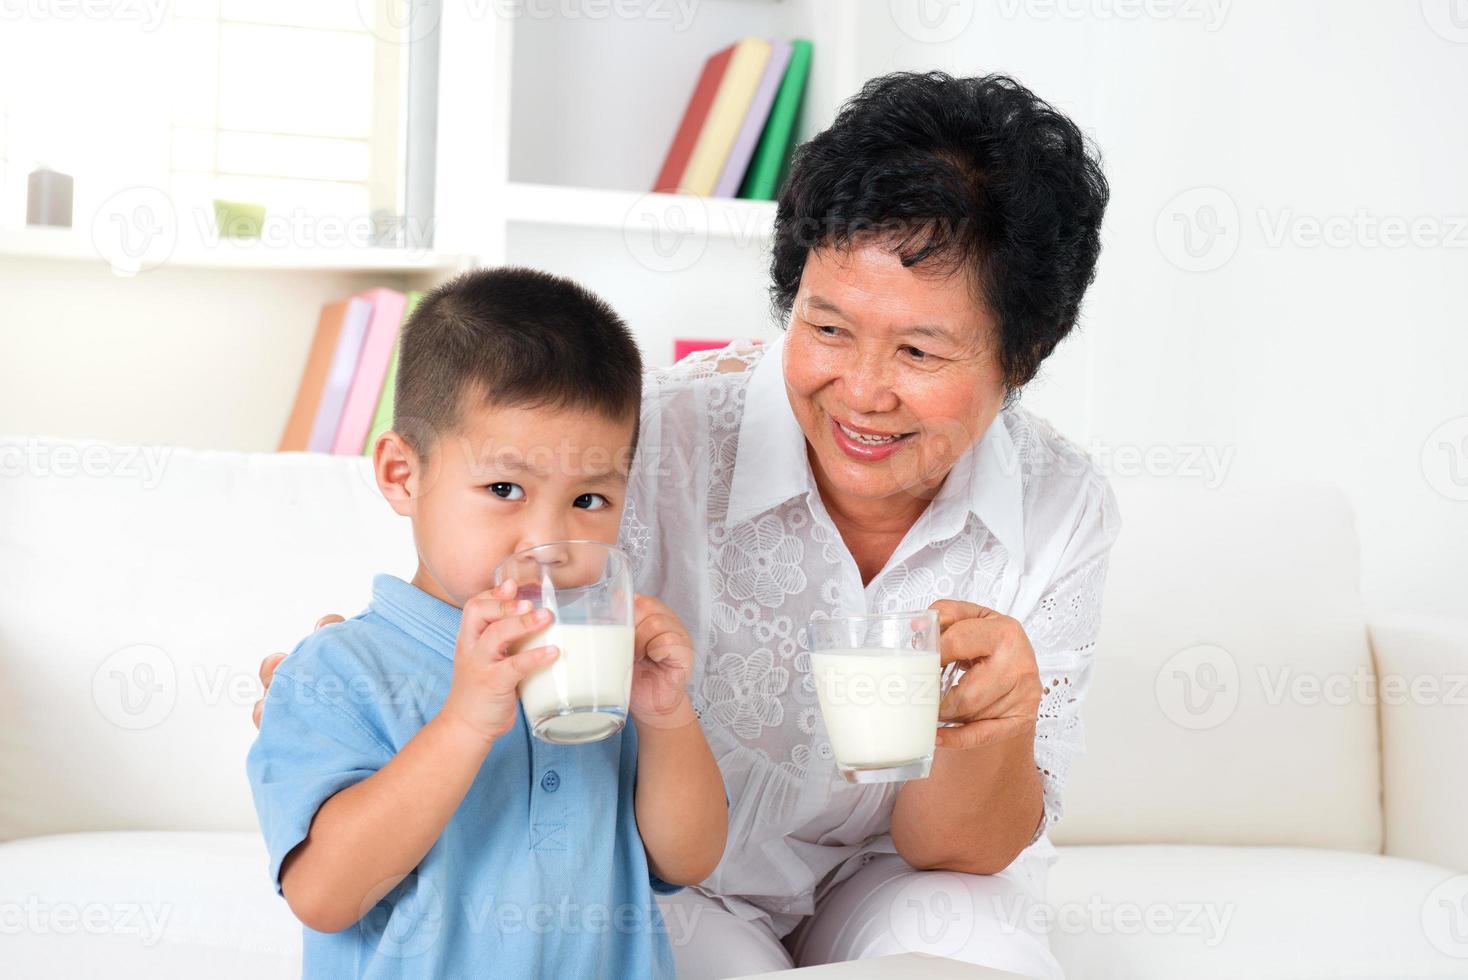 bere latte insieme foto